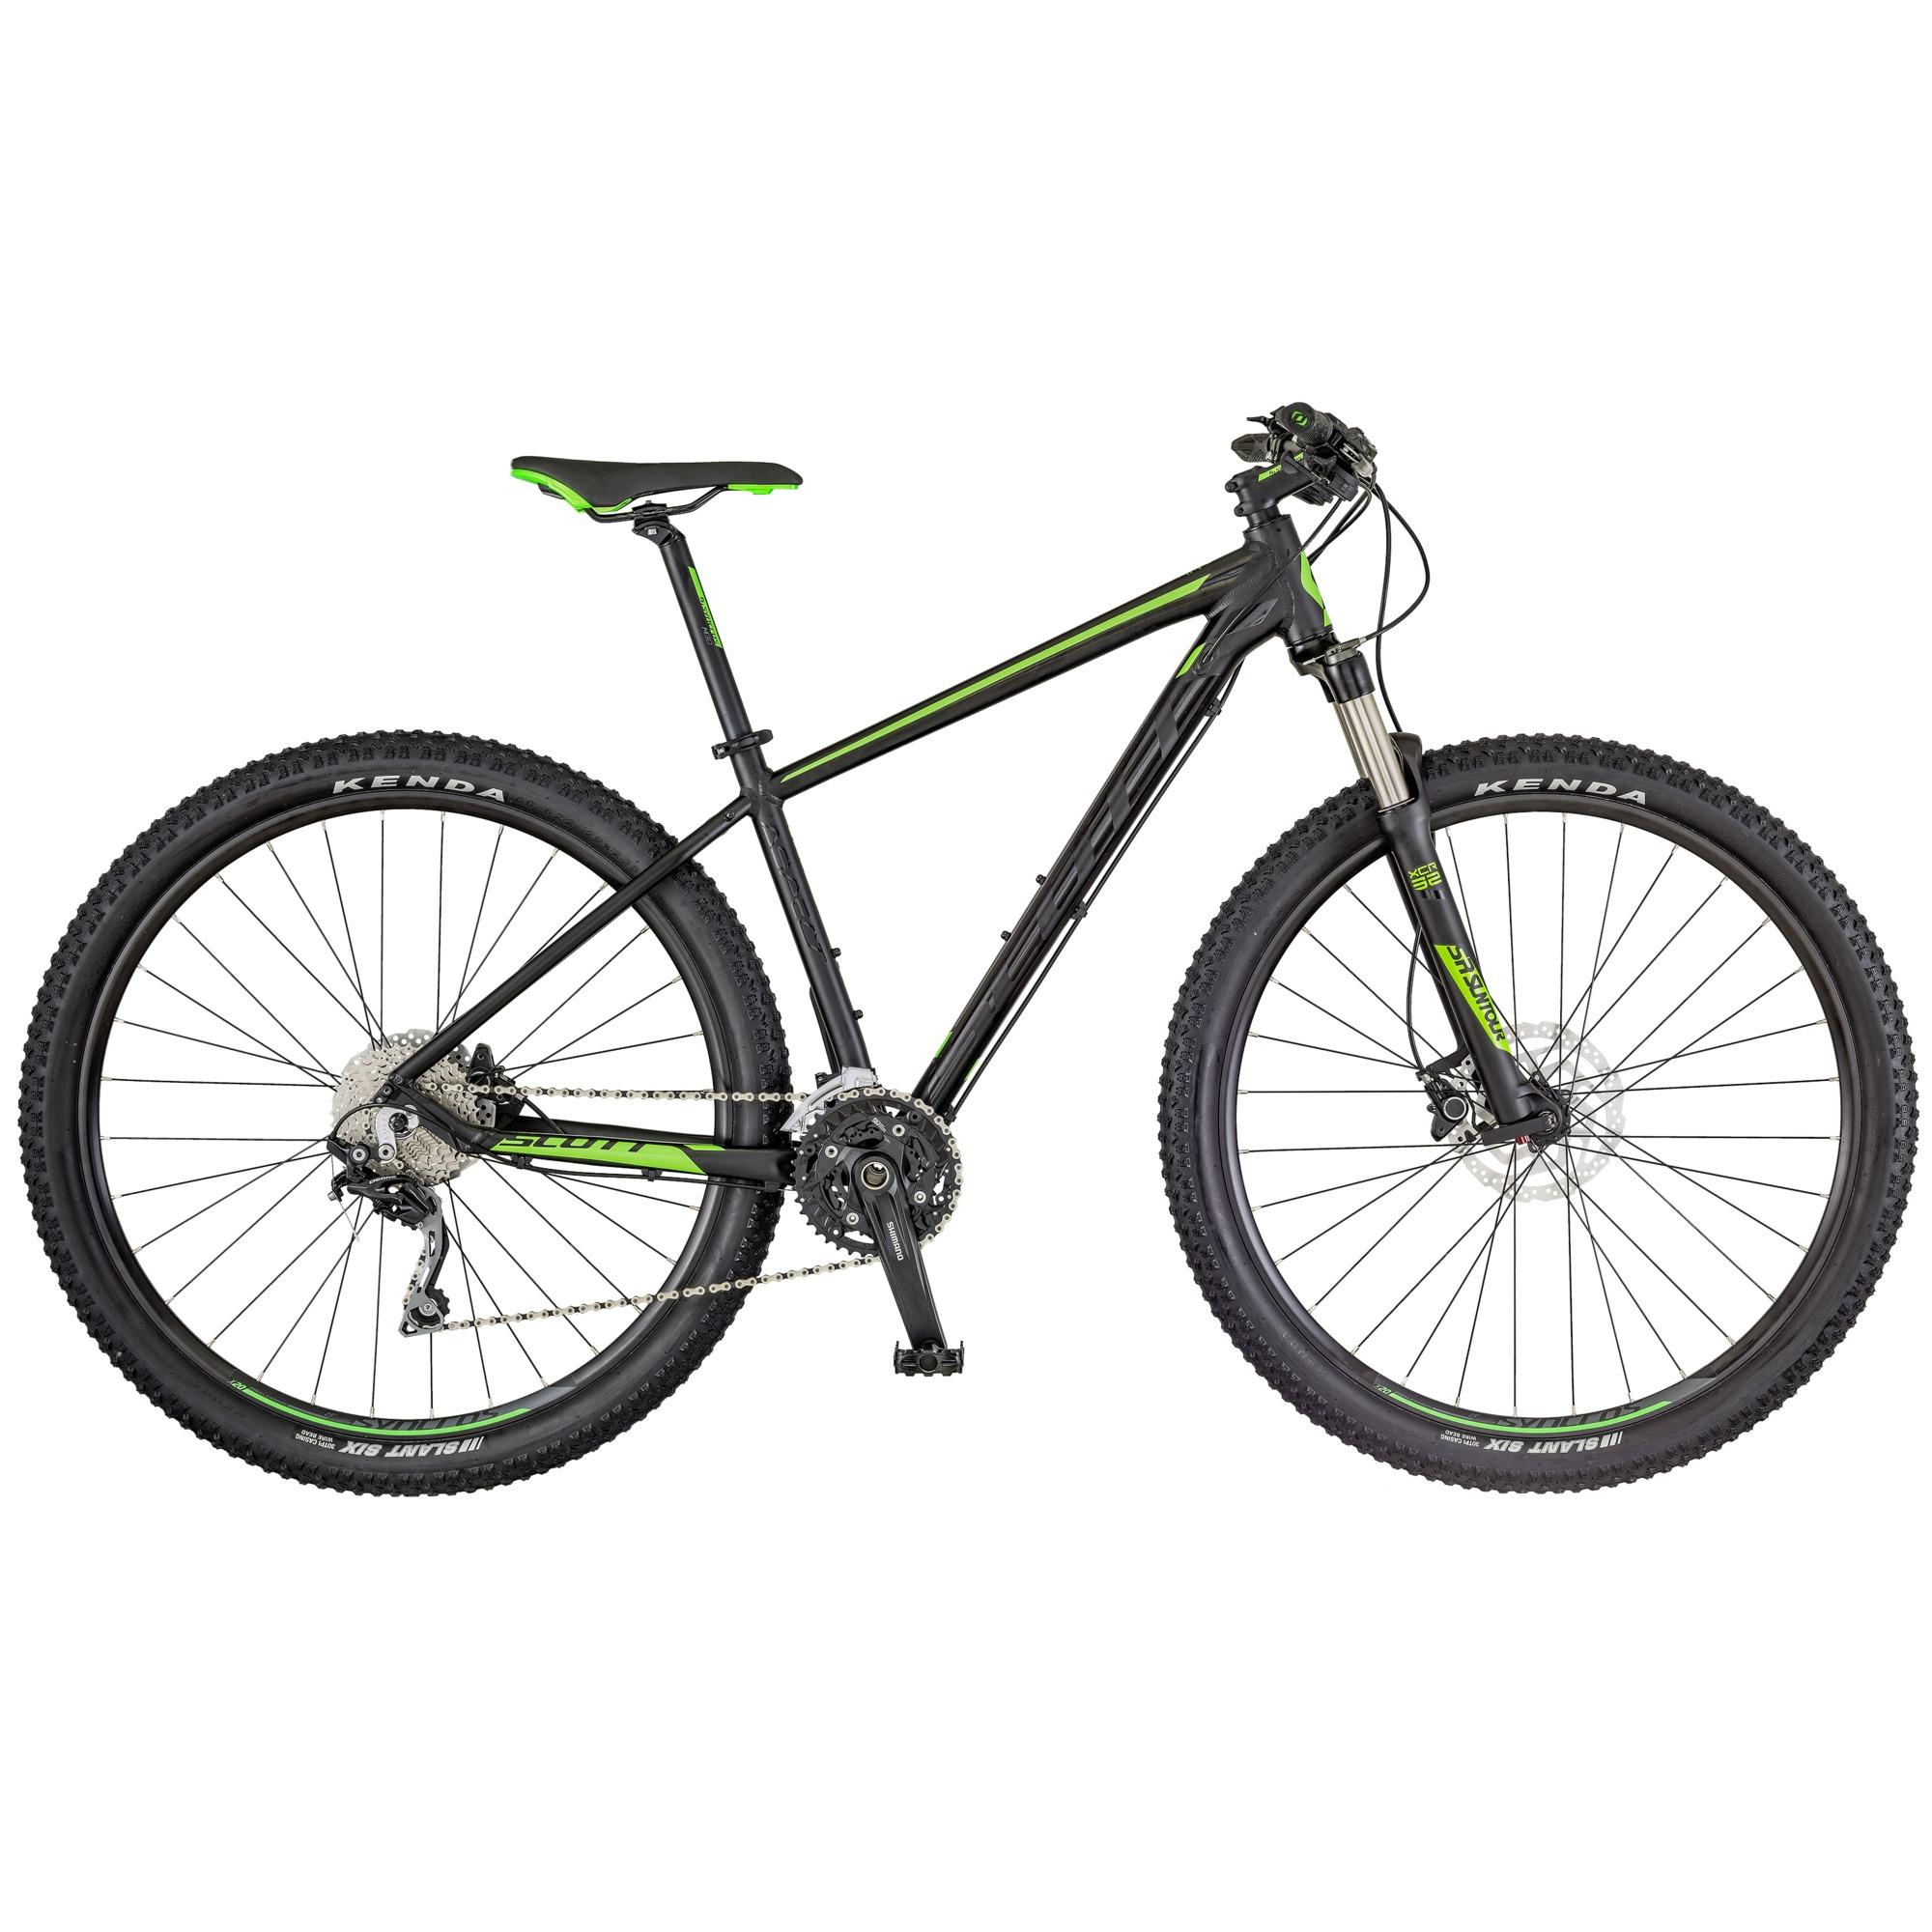 SCOTT Aspect 920 Bike L - Zweirad Homann